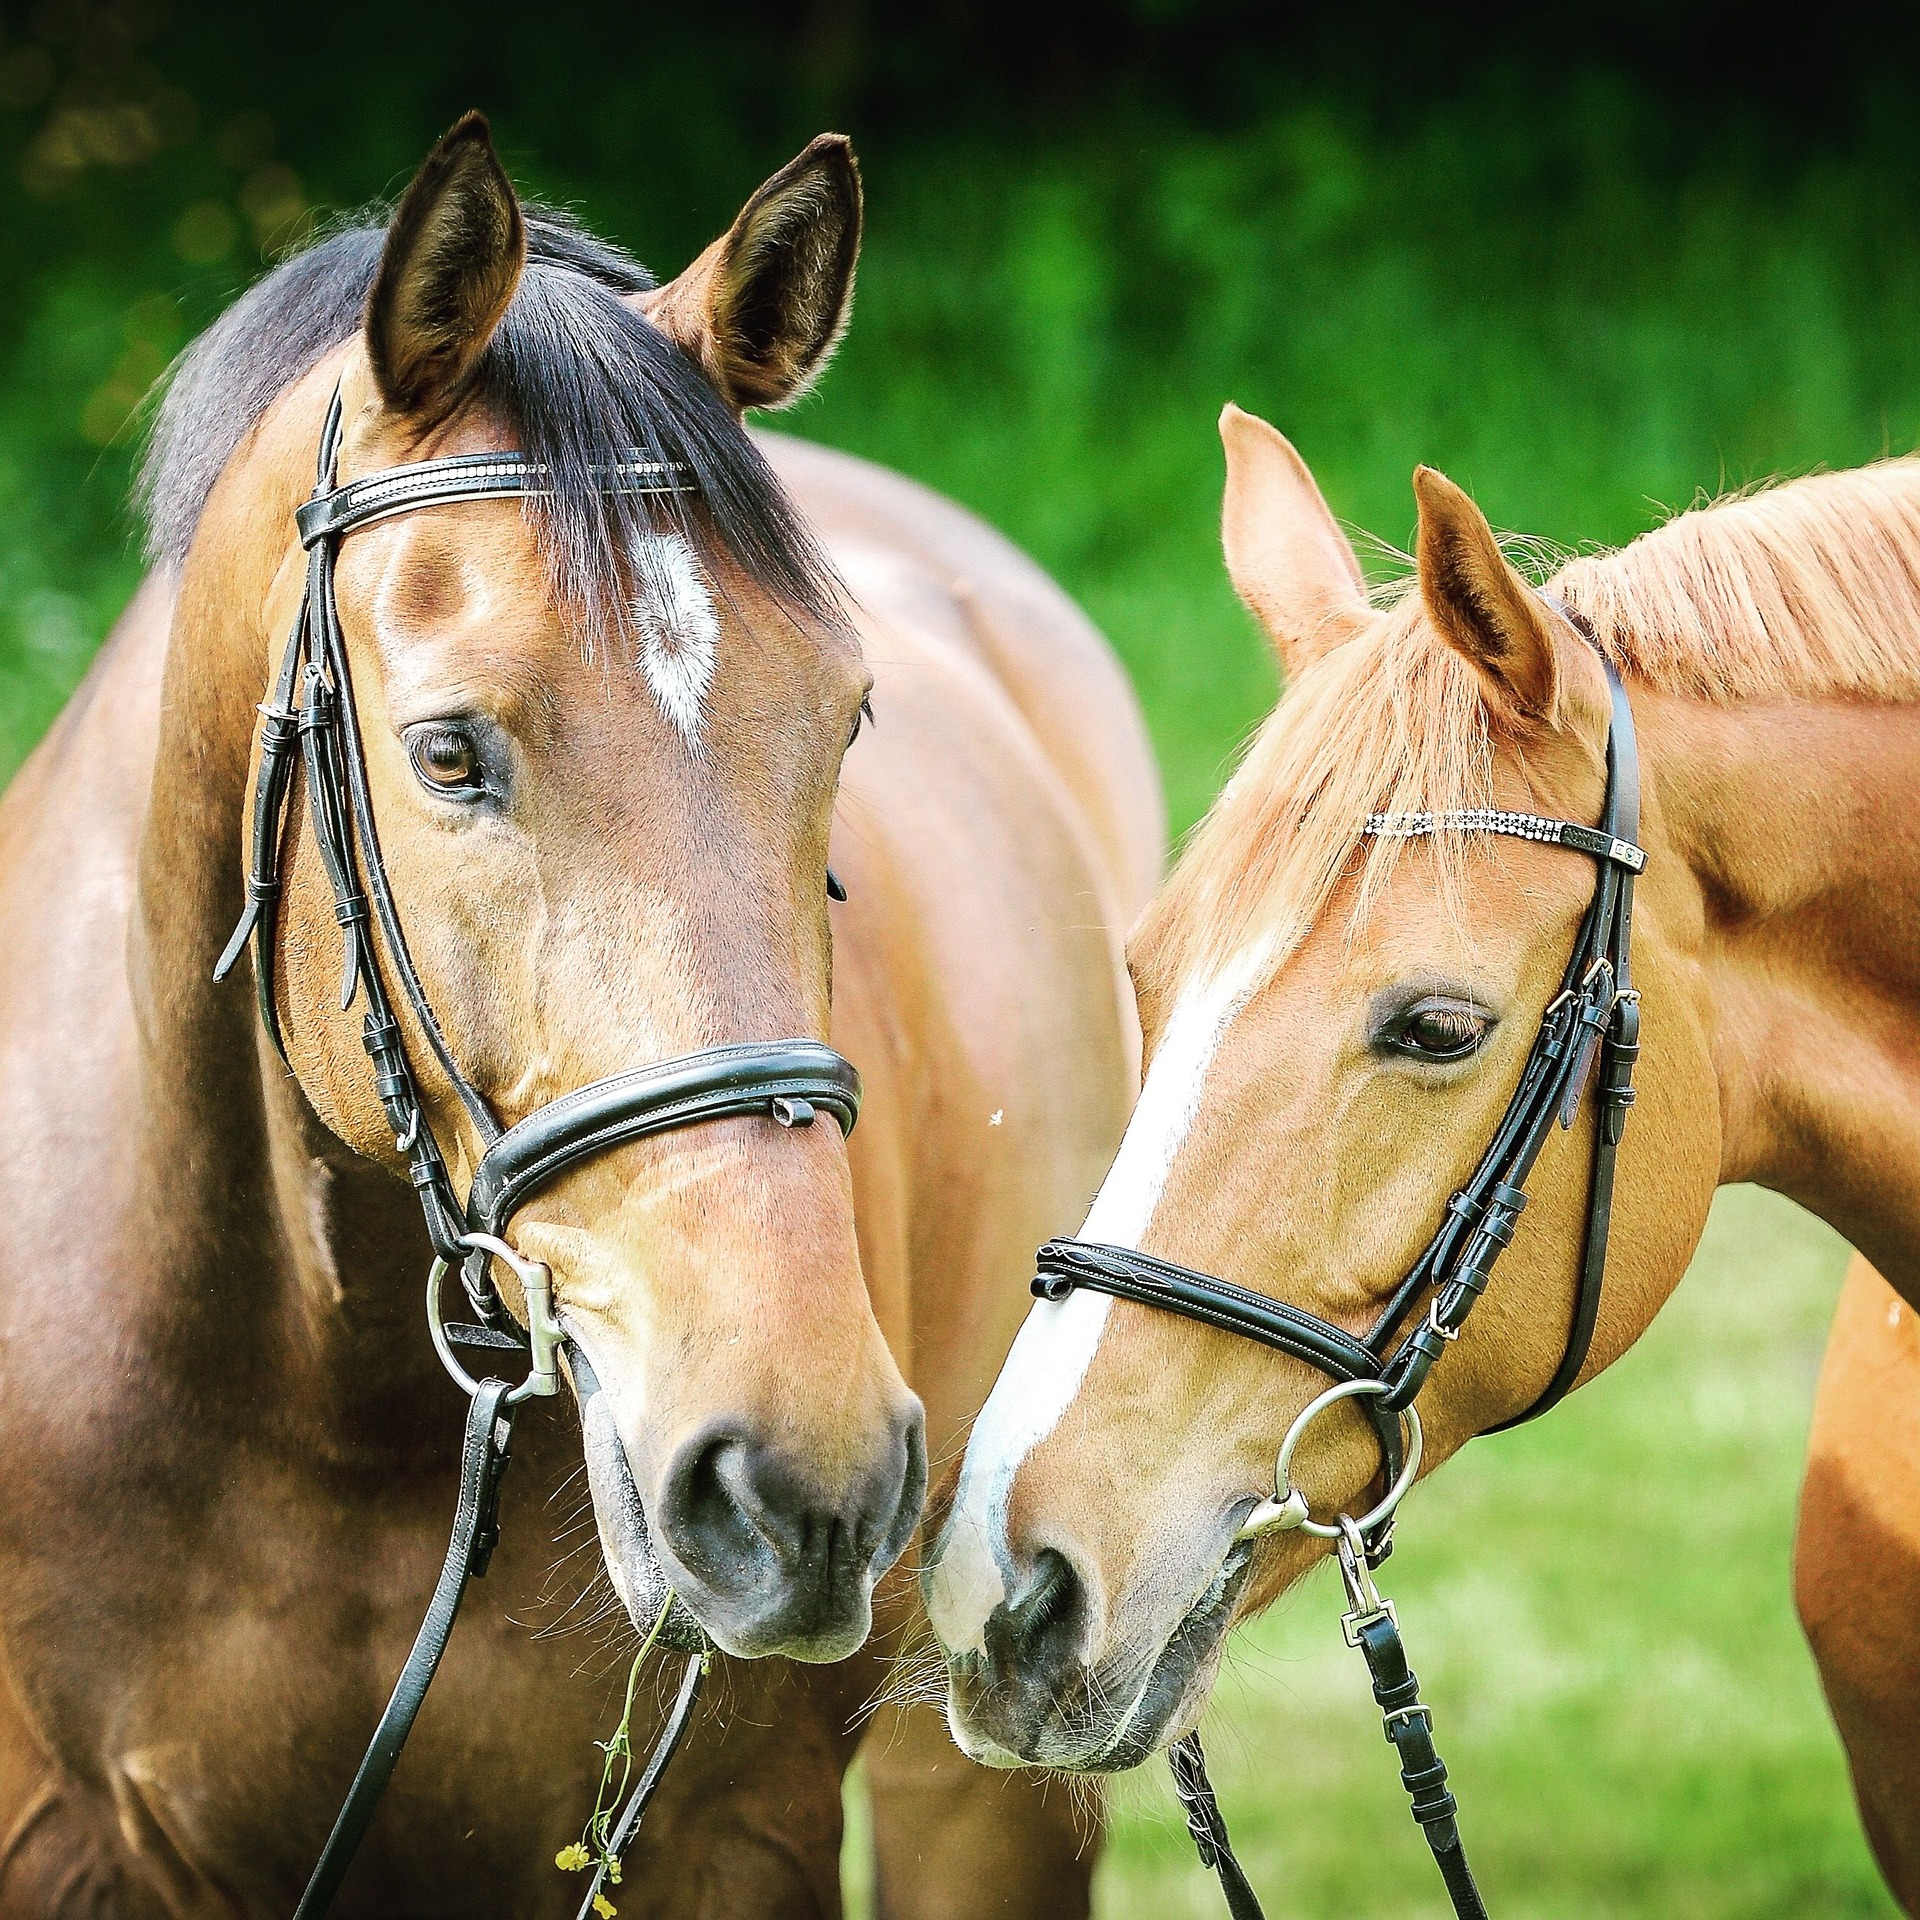 caballo-teniendo-sexo-con-mujere-indian-hardcore-sex-photos